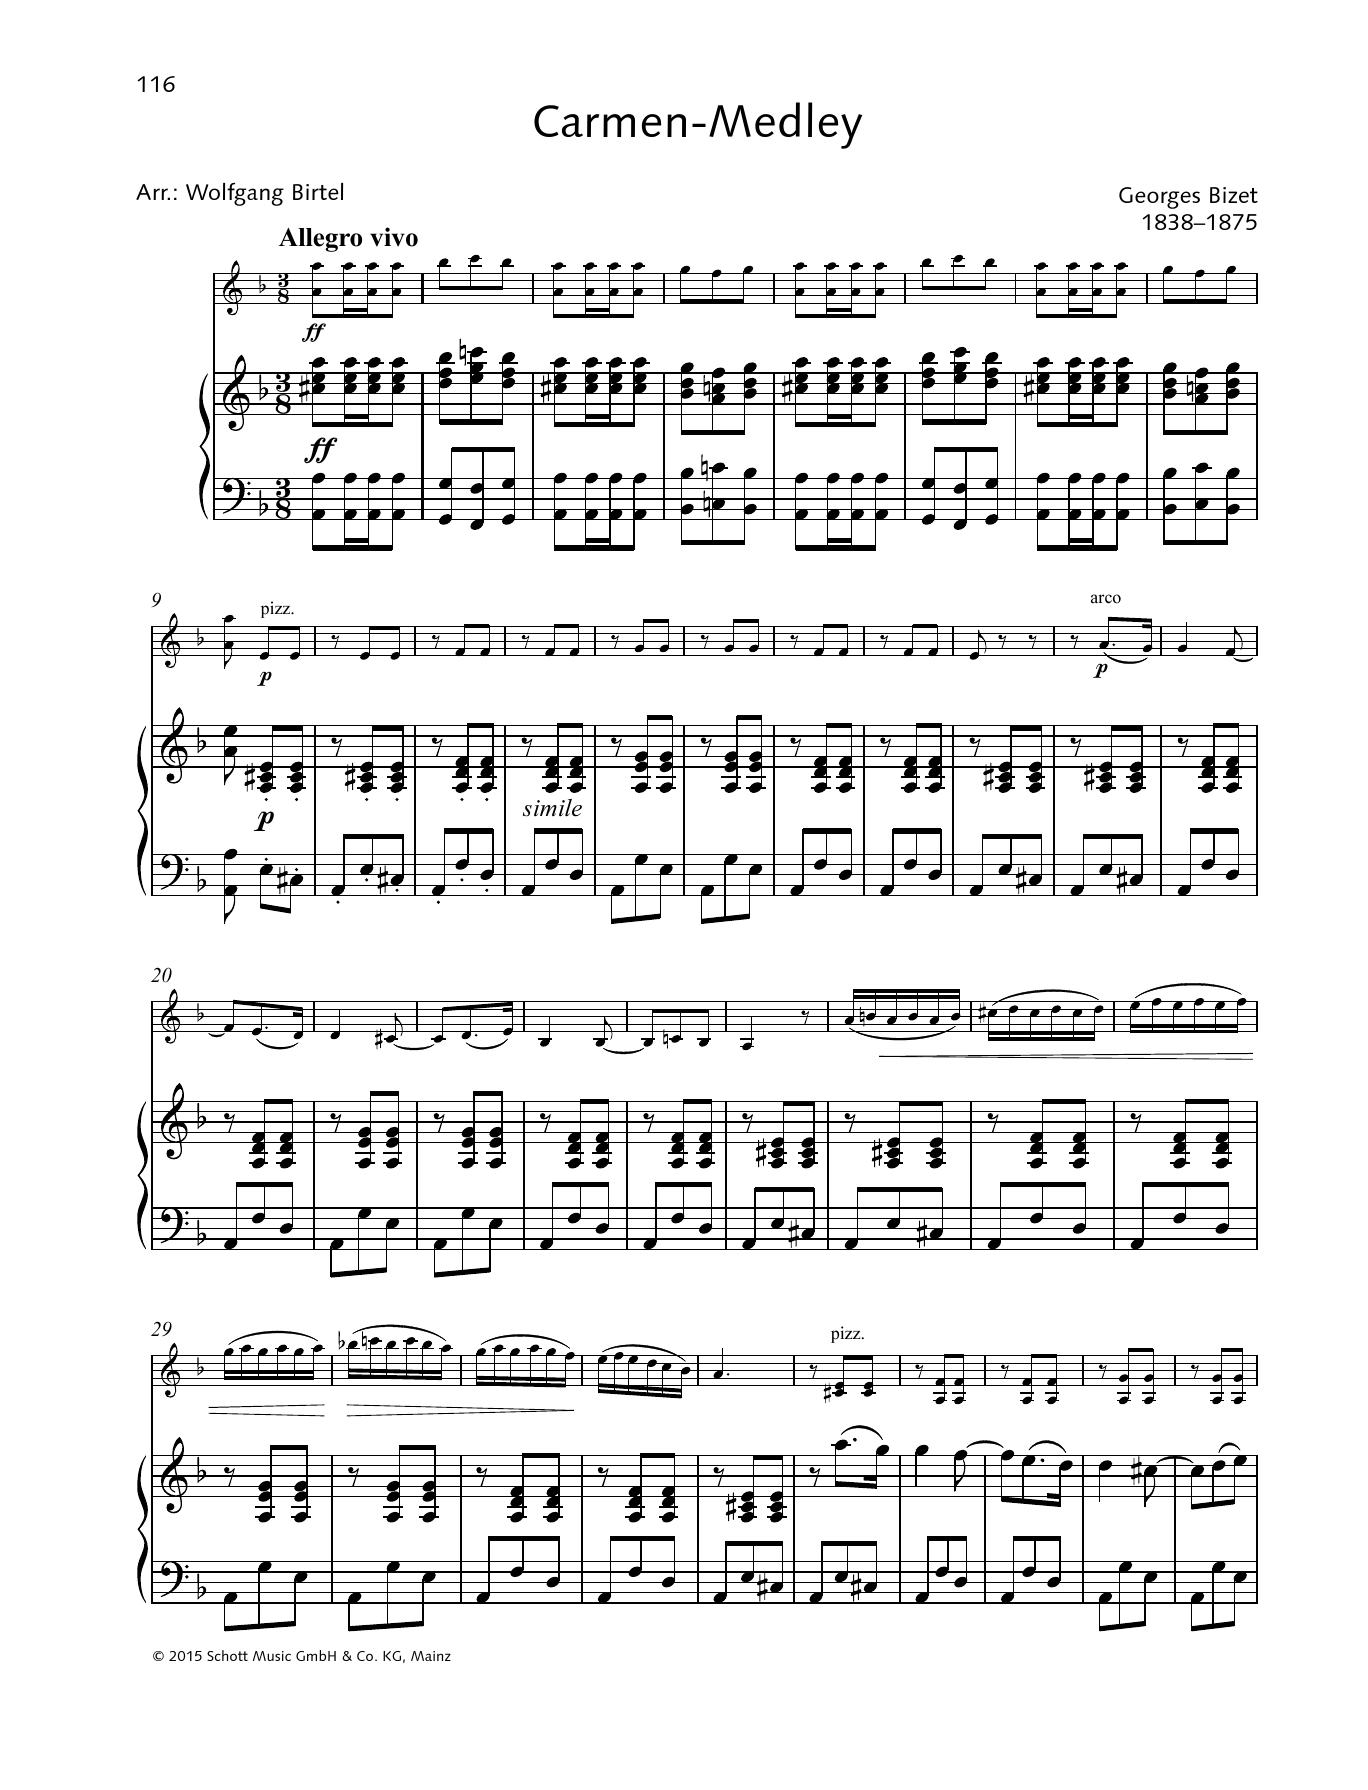 Carmen-Medley Sheet Music